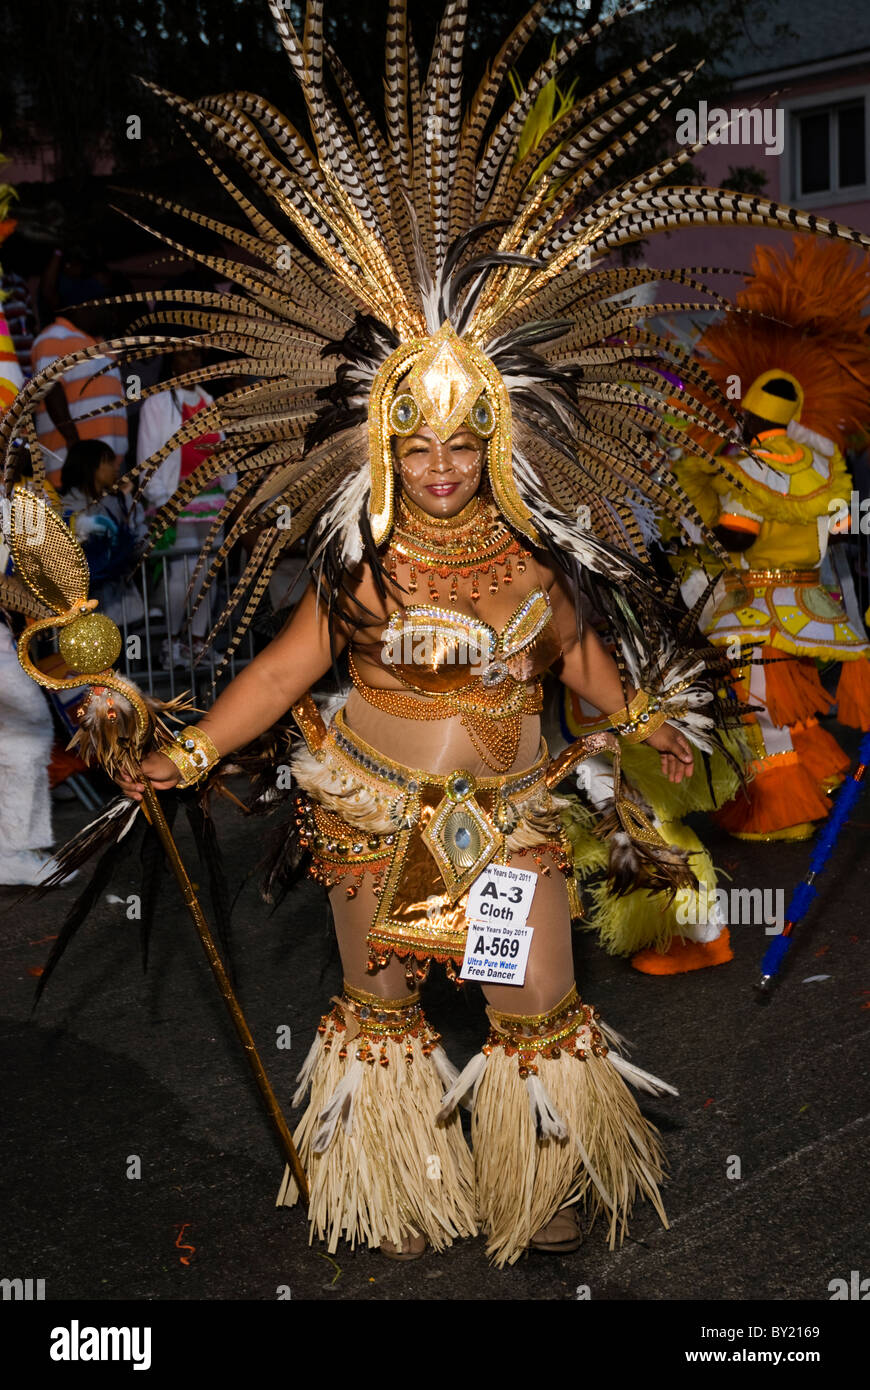 Female Dancer, Junkanoo, New Year's Day, 2011, Nassau, Bahamas - Stock Image